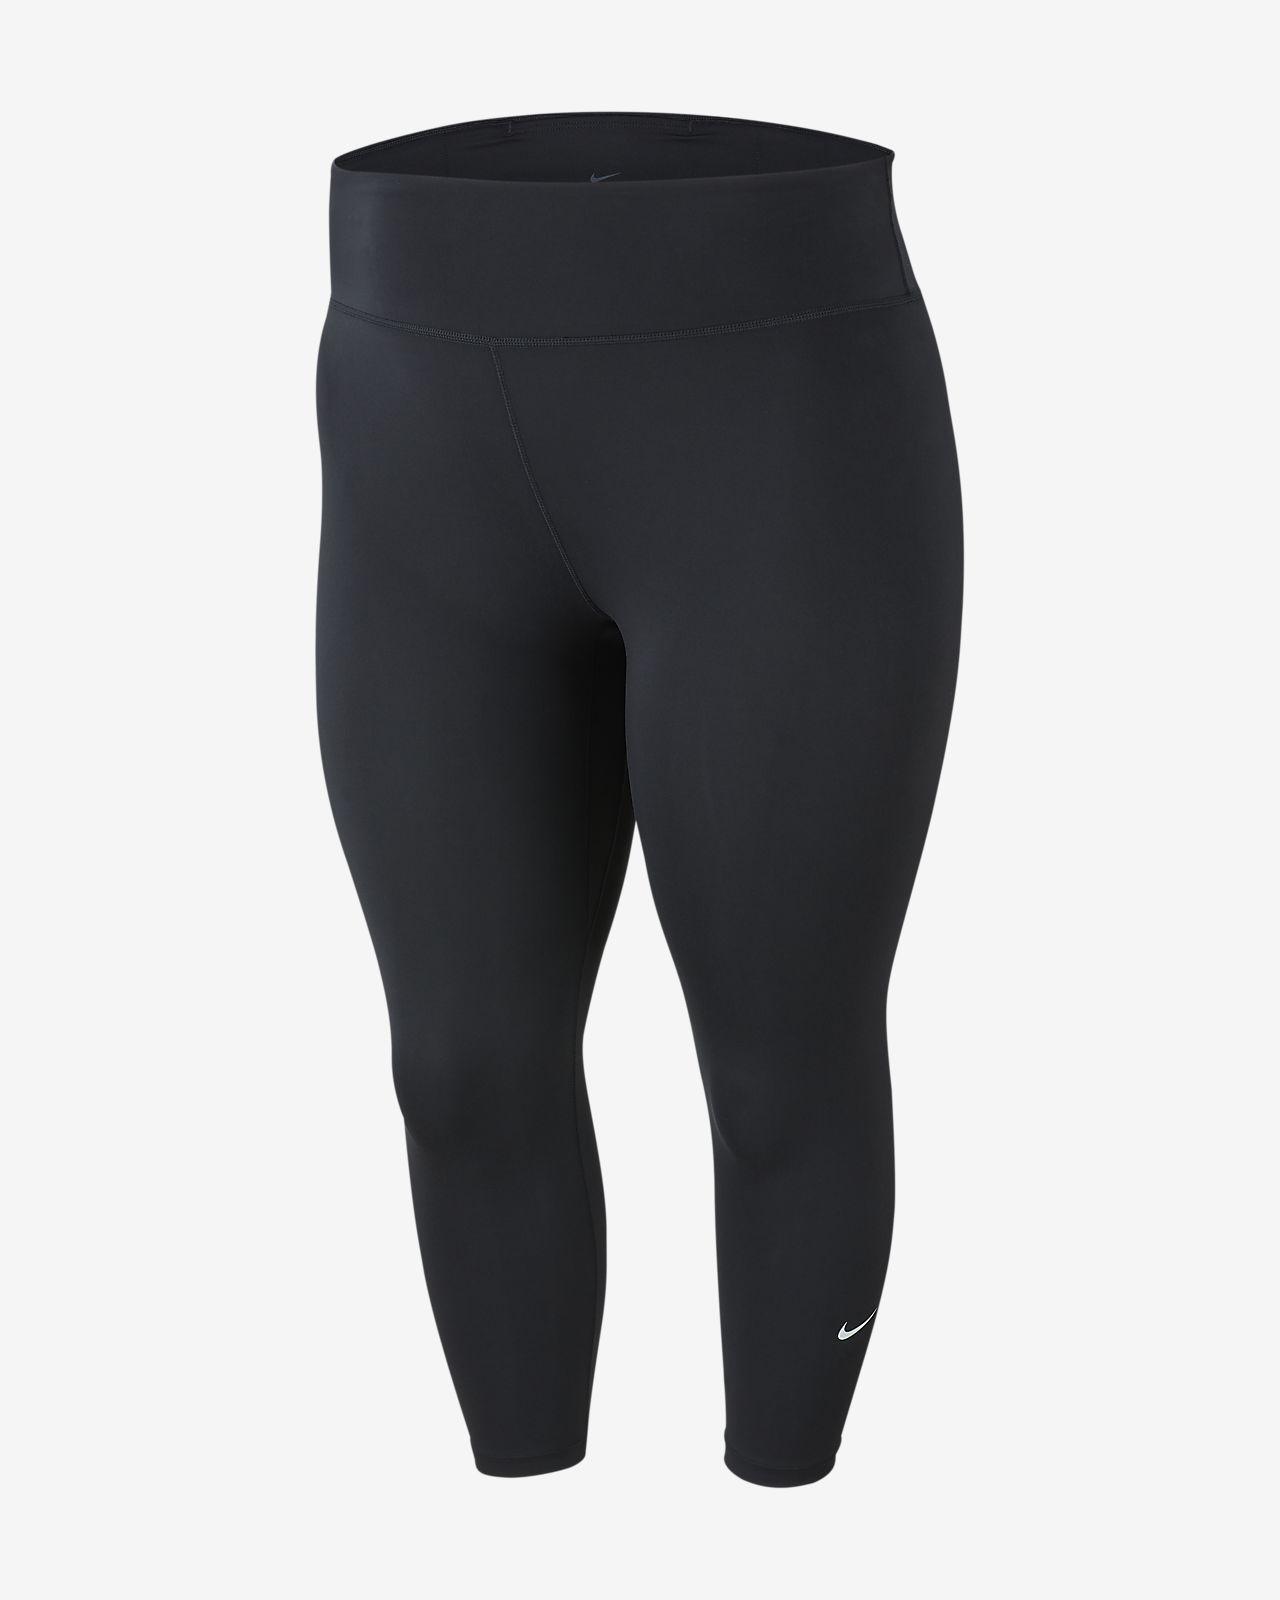 Nike One Women's Crops (Plus Size)